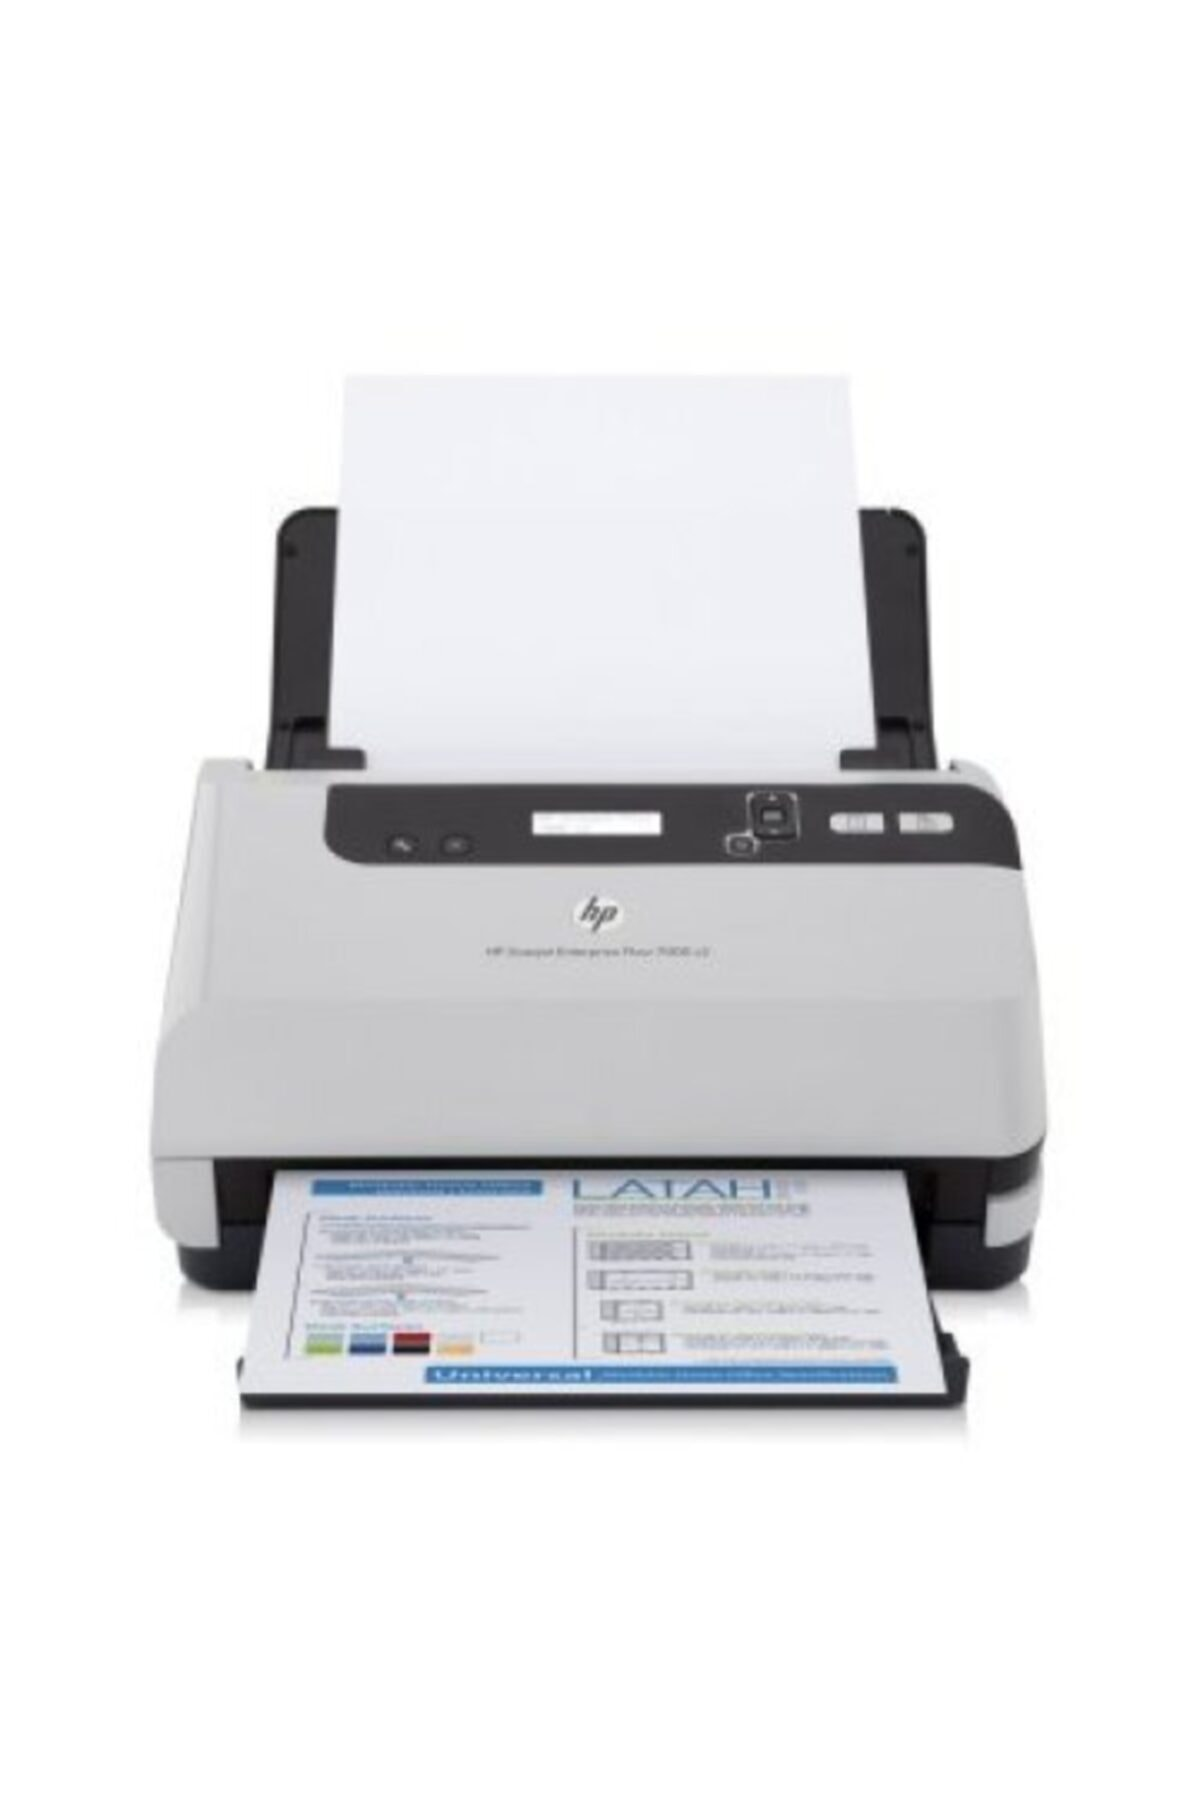 HP Scanjet Enterprıse Flow 7000 S2 Tarayıcı 1